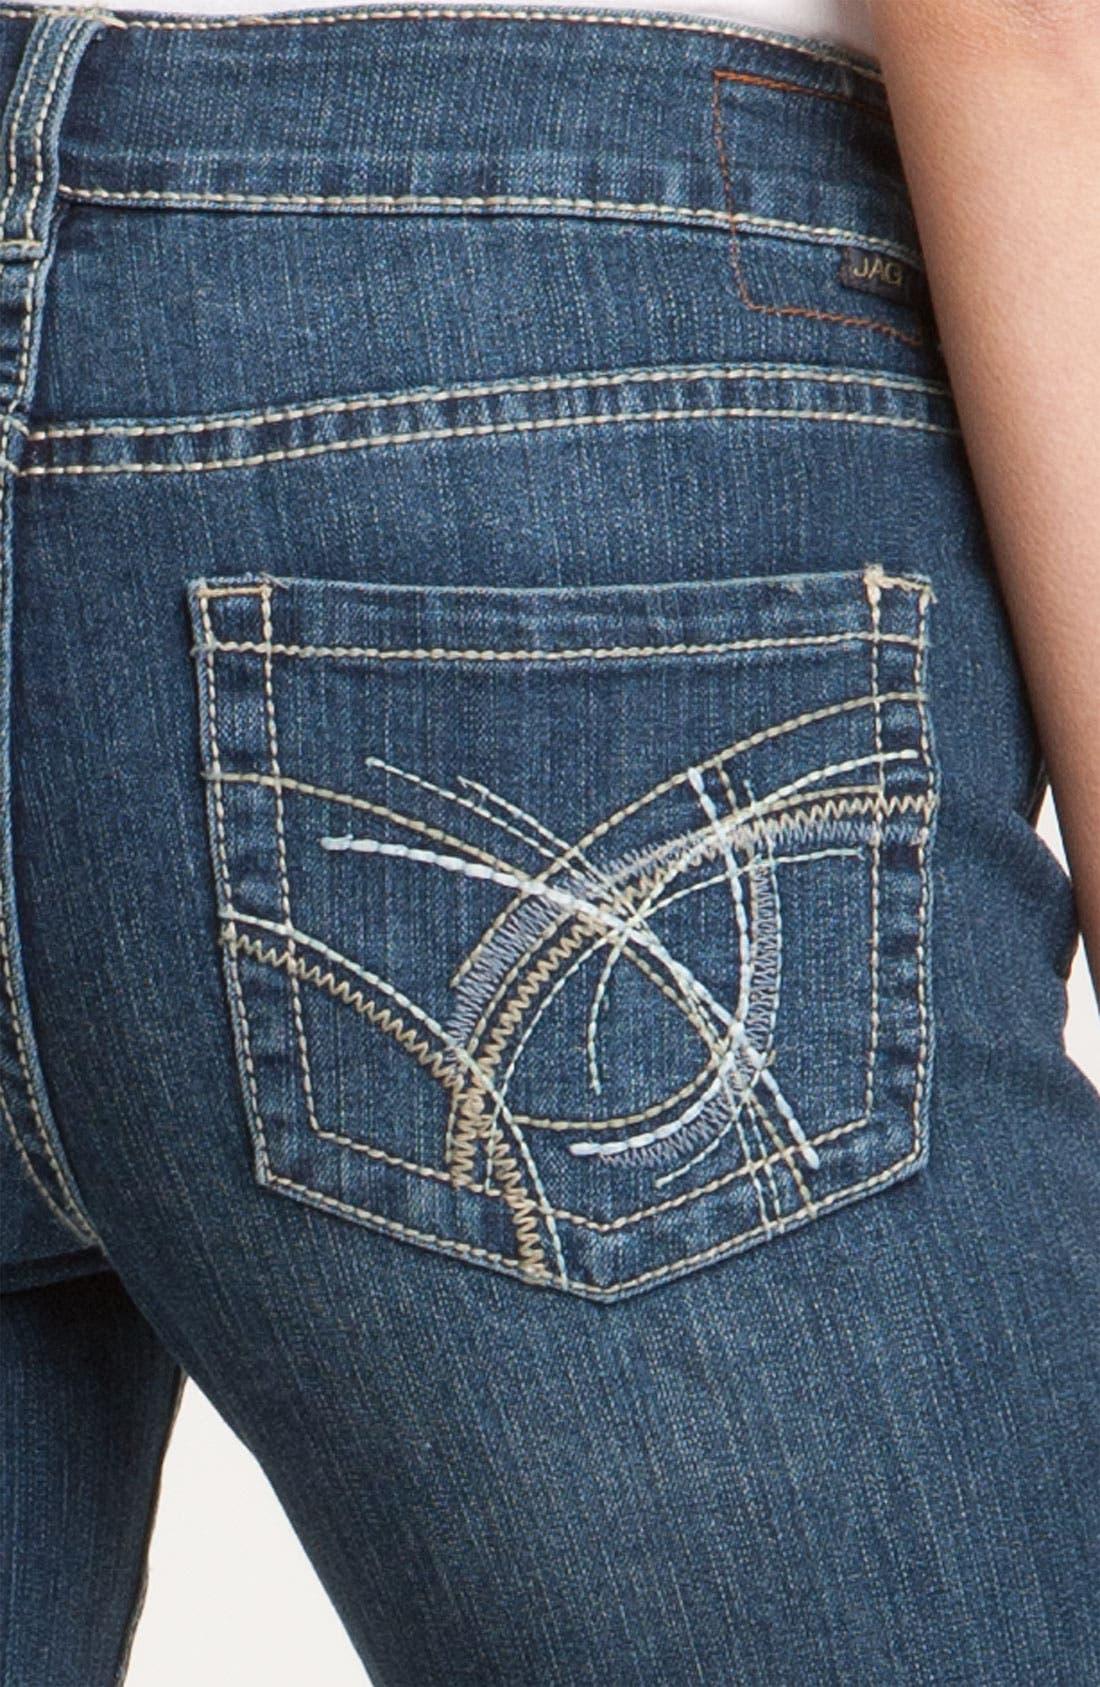 Alternate Image 3  - Jag Jeans 'Selma' Crop Jeans (Petite)